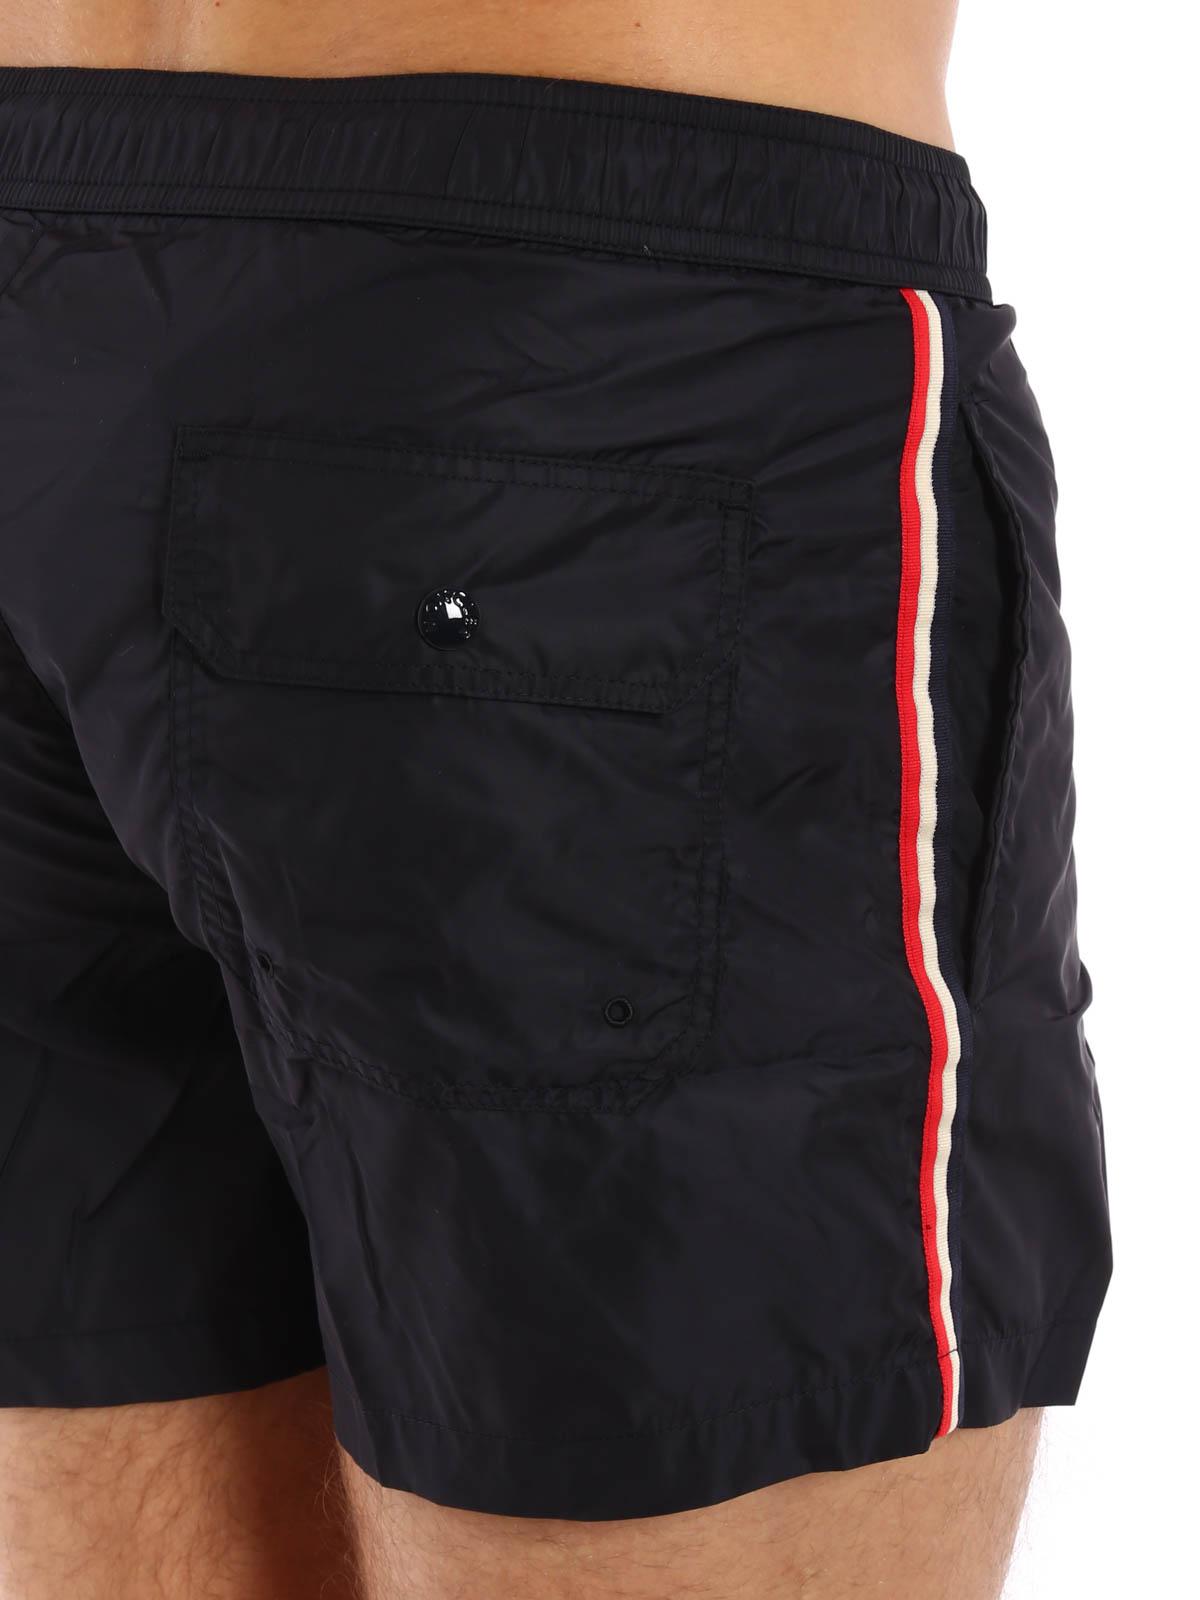 fded053ee0 Moncler - Swim shorts - Swim shorts & swimming trunks - B1 091 ...